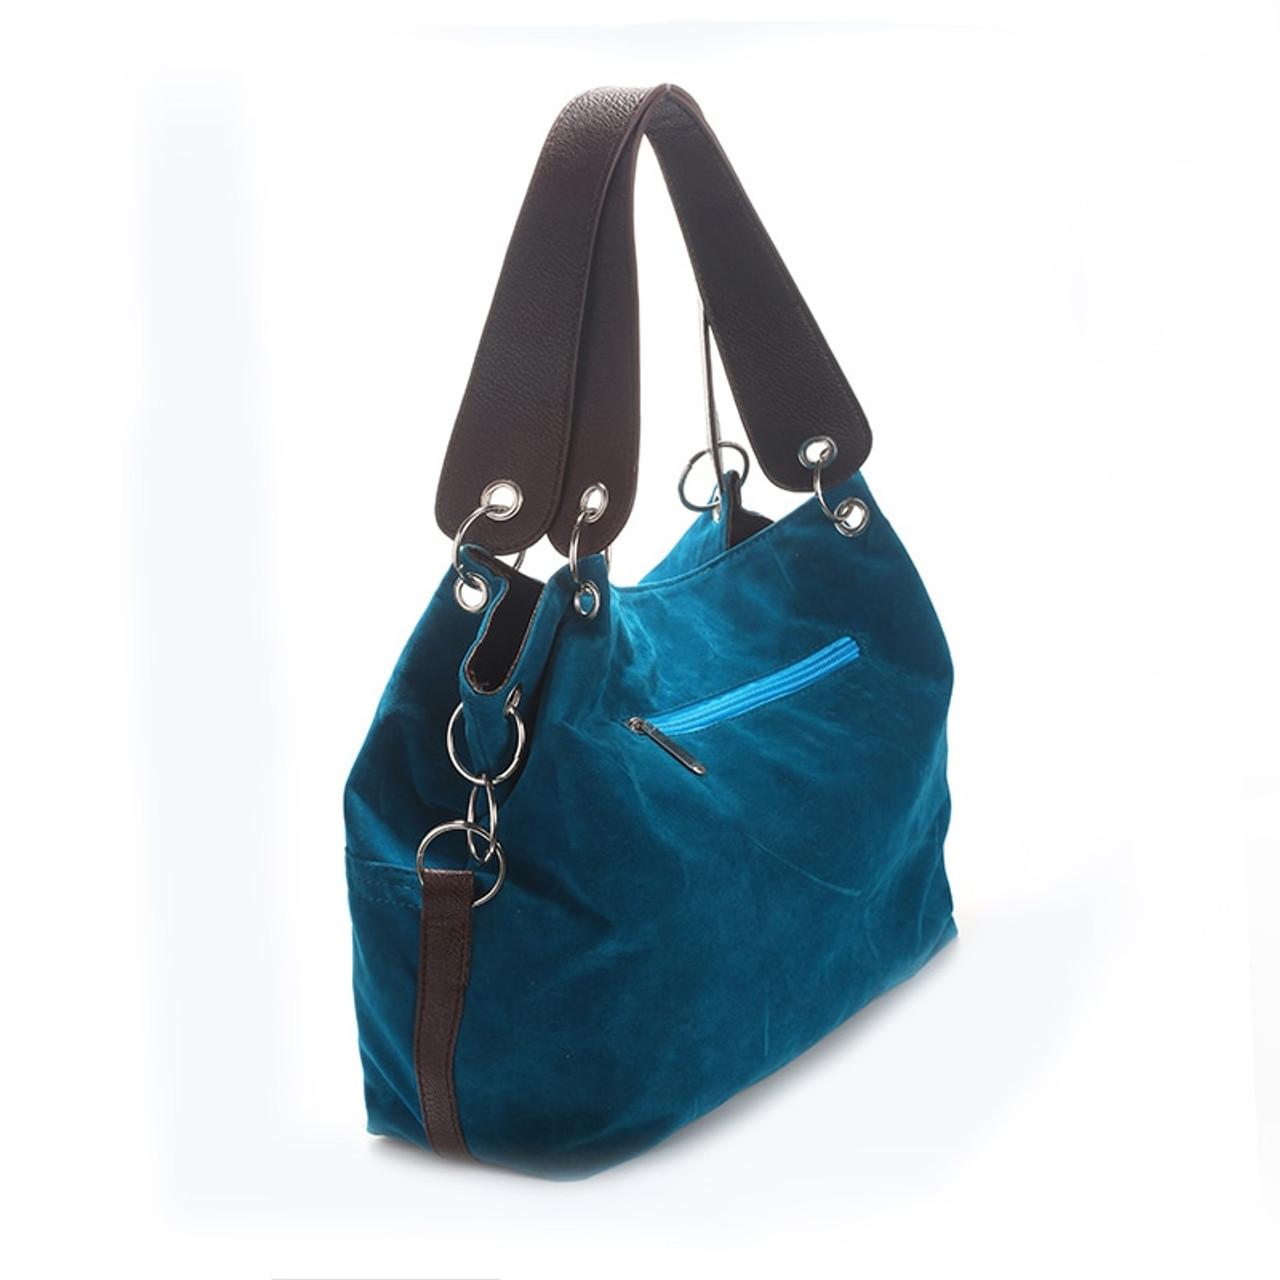 b39c36f2ab72 ... SWDF New Brand handbag female large totes high quality ladies shoulder  messenger top-handle bags ...